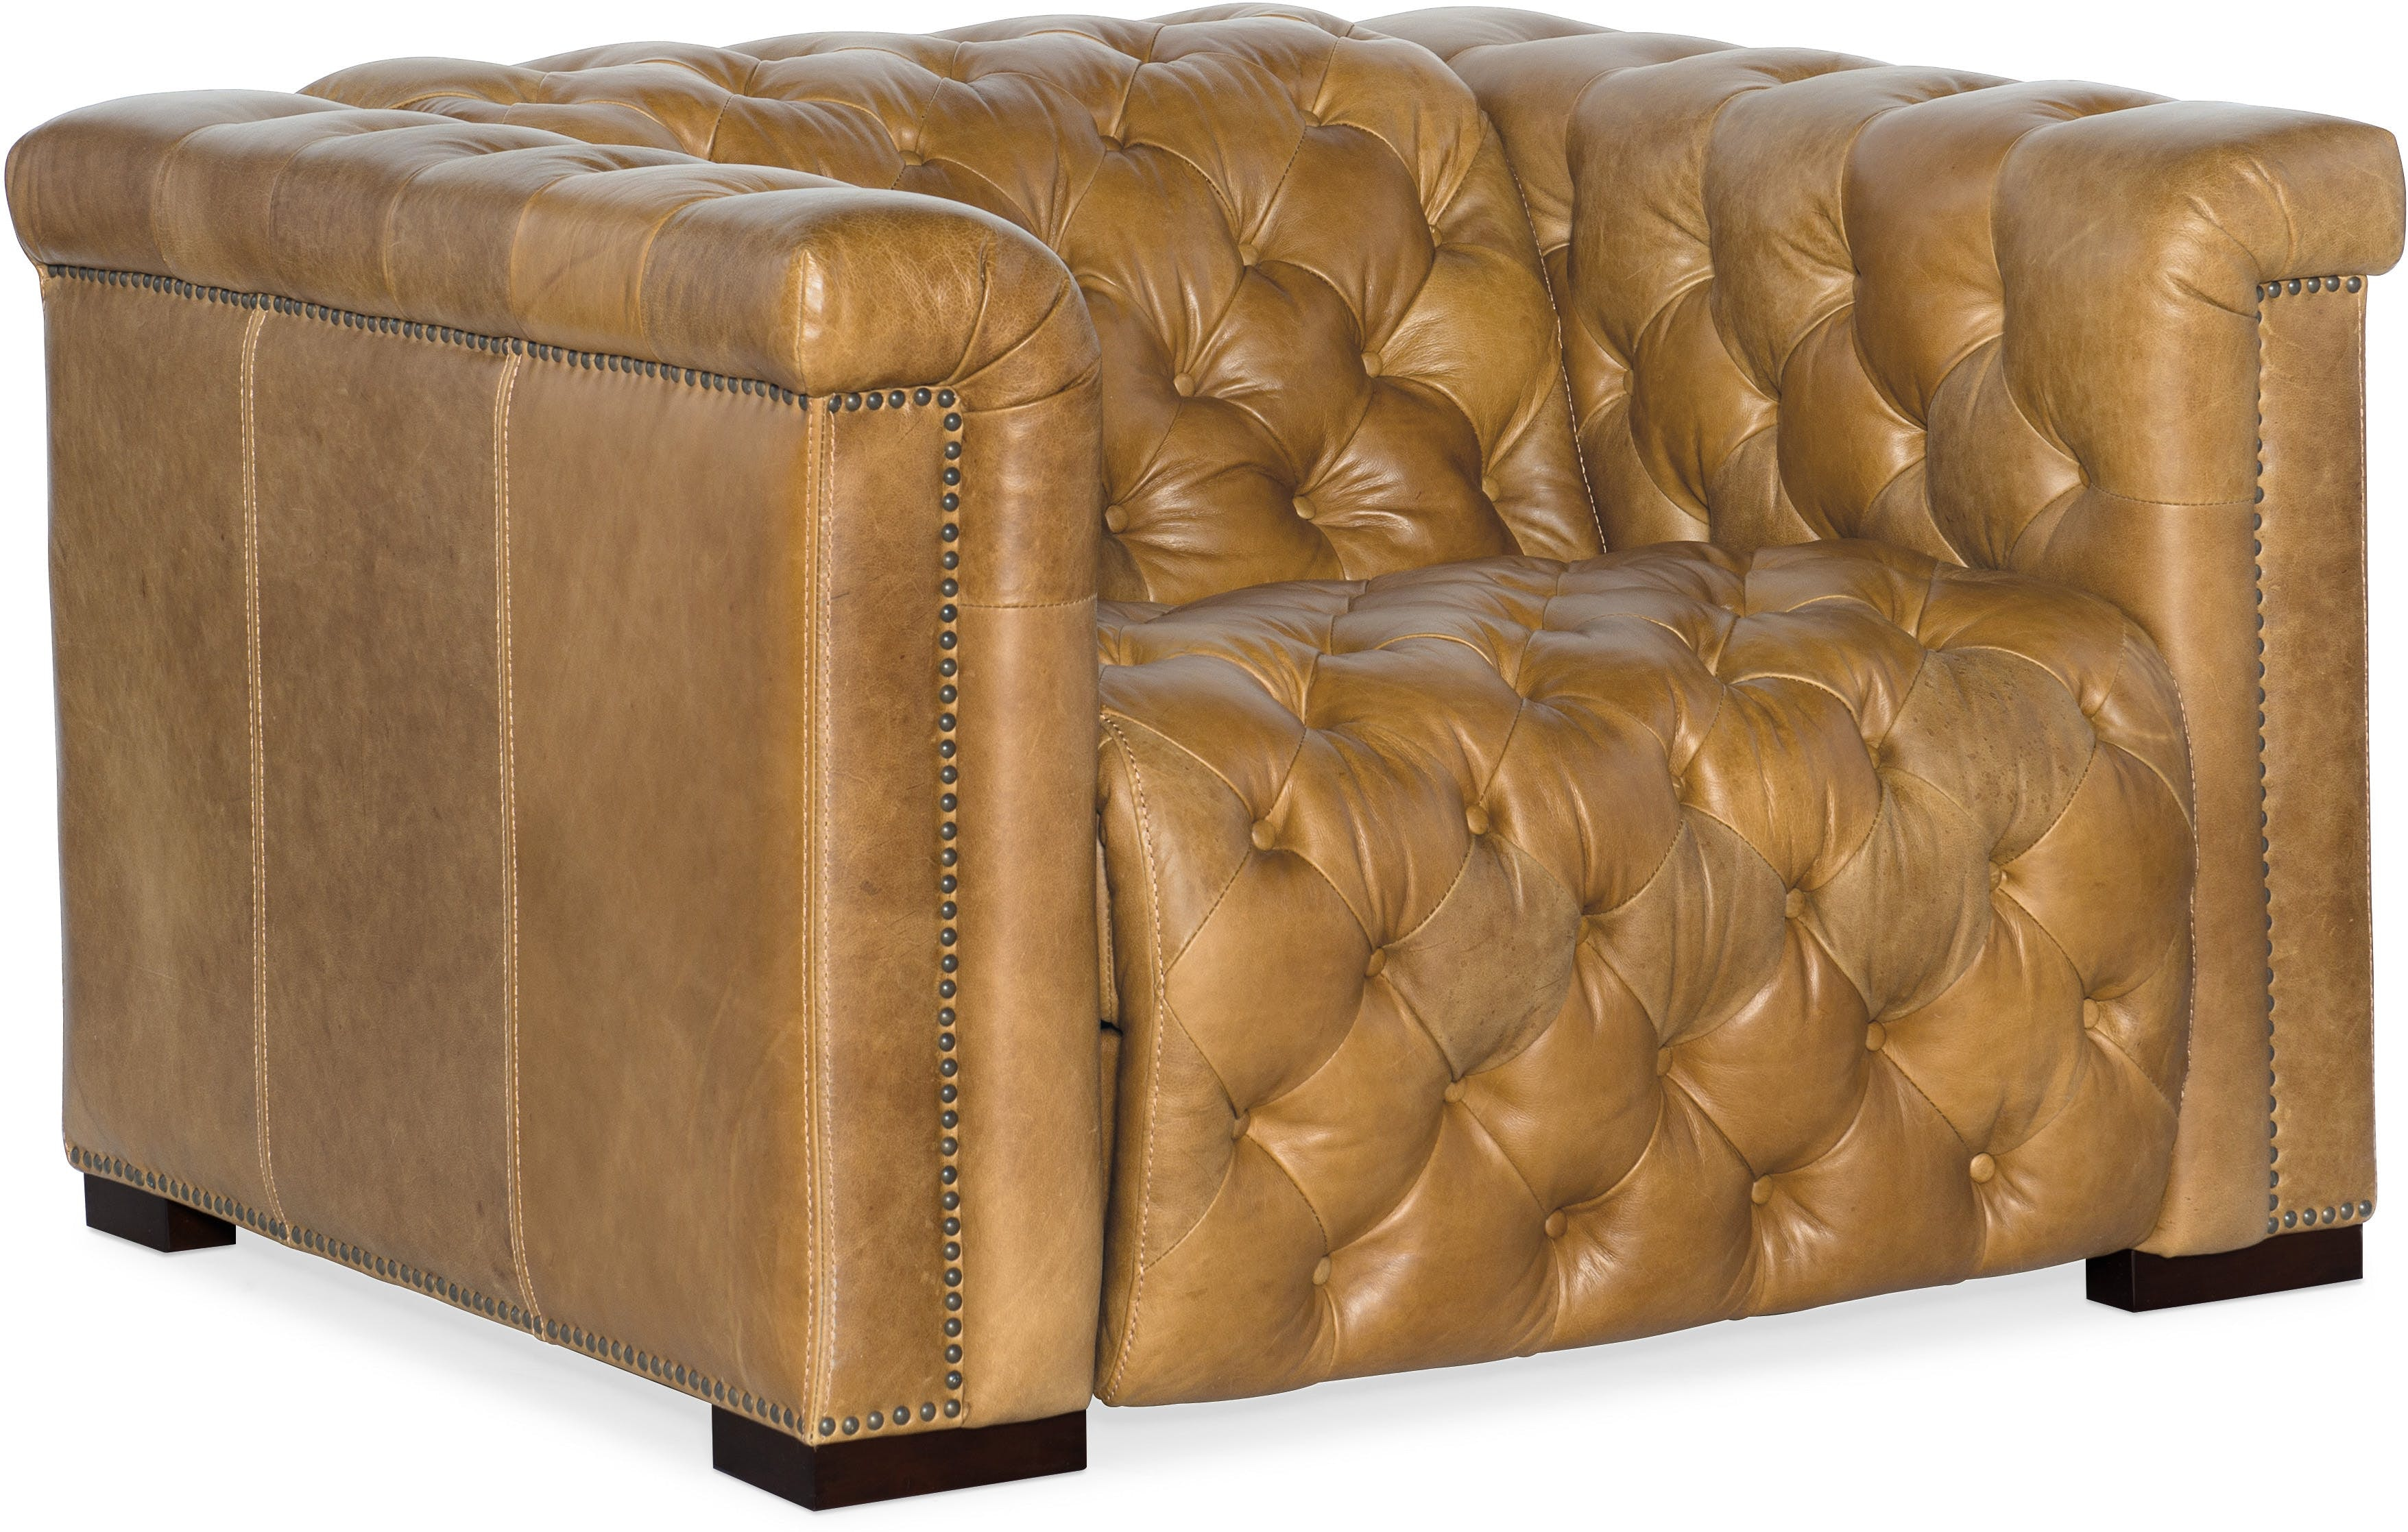 Stock Program SAVION RECLINING CHESTERFIELD CHAIR HSSS434P1086ST From  Walter E. Smithe Furniture + Design